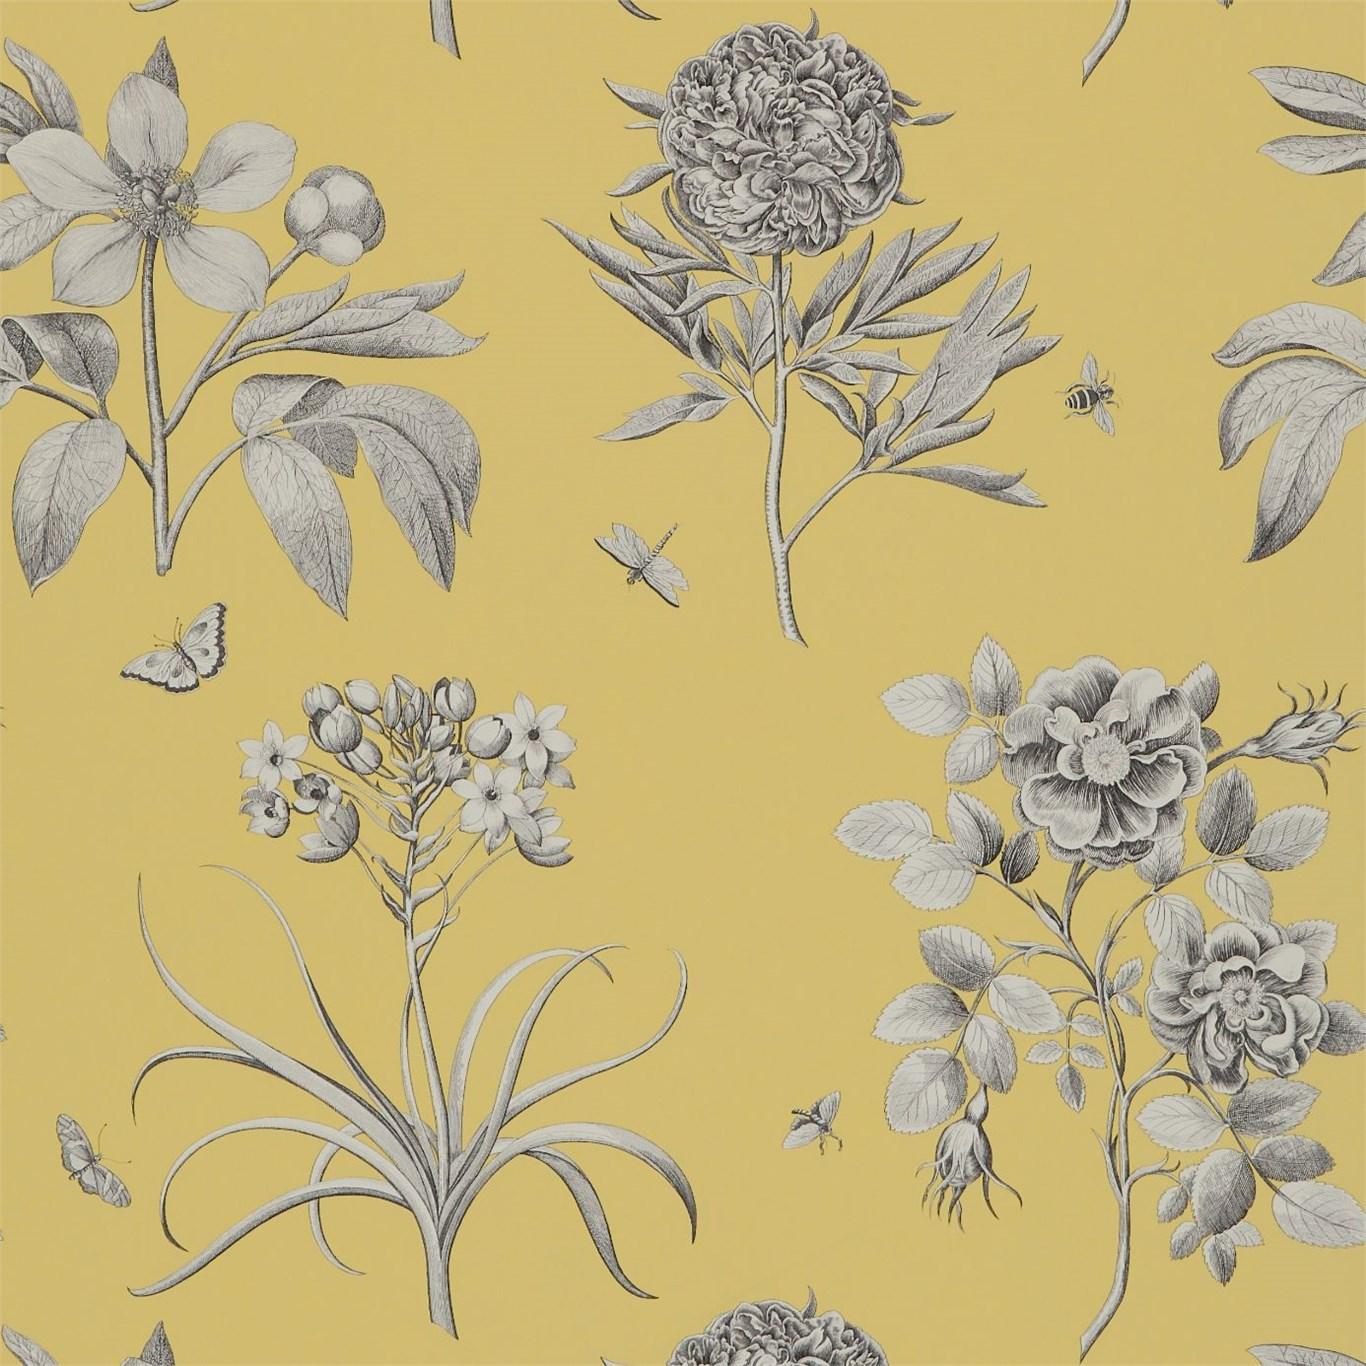 Обои Sanderson Parchment Flowers DPFWER104, интернет магазин Волео